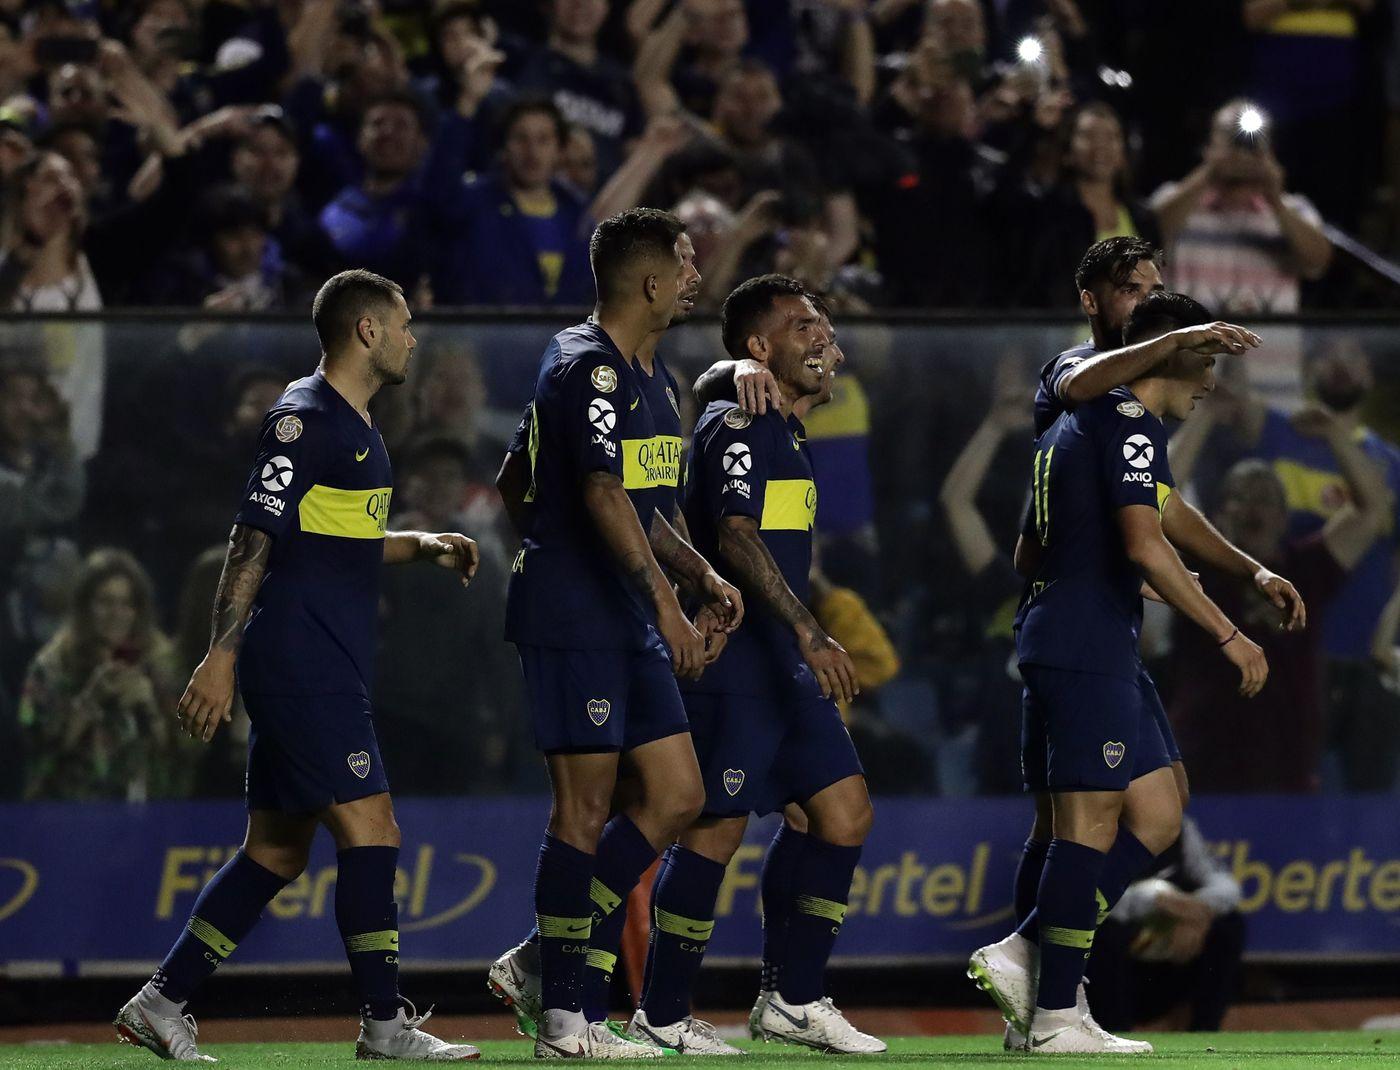 Tolima-Boca Juniors mercoledì 24 aprile